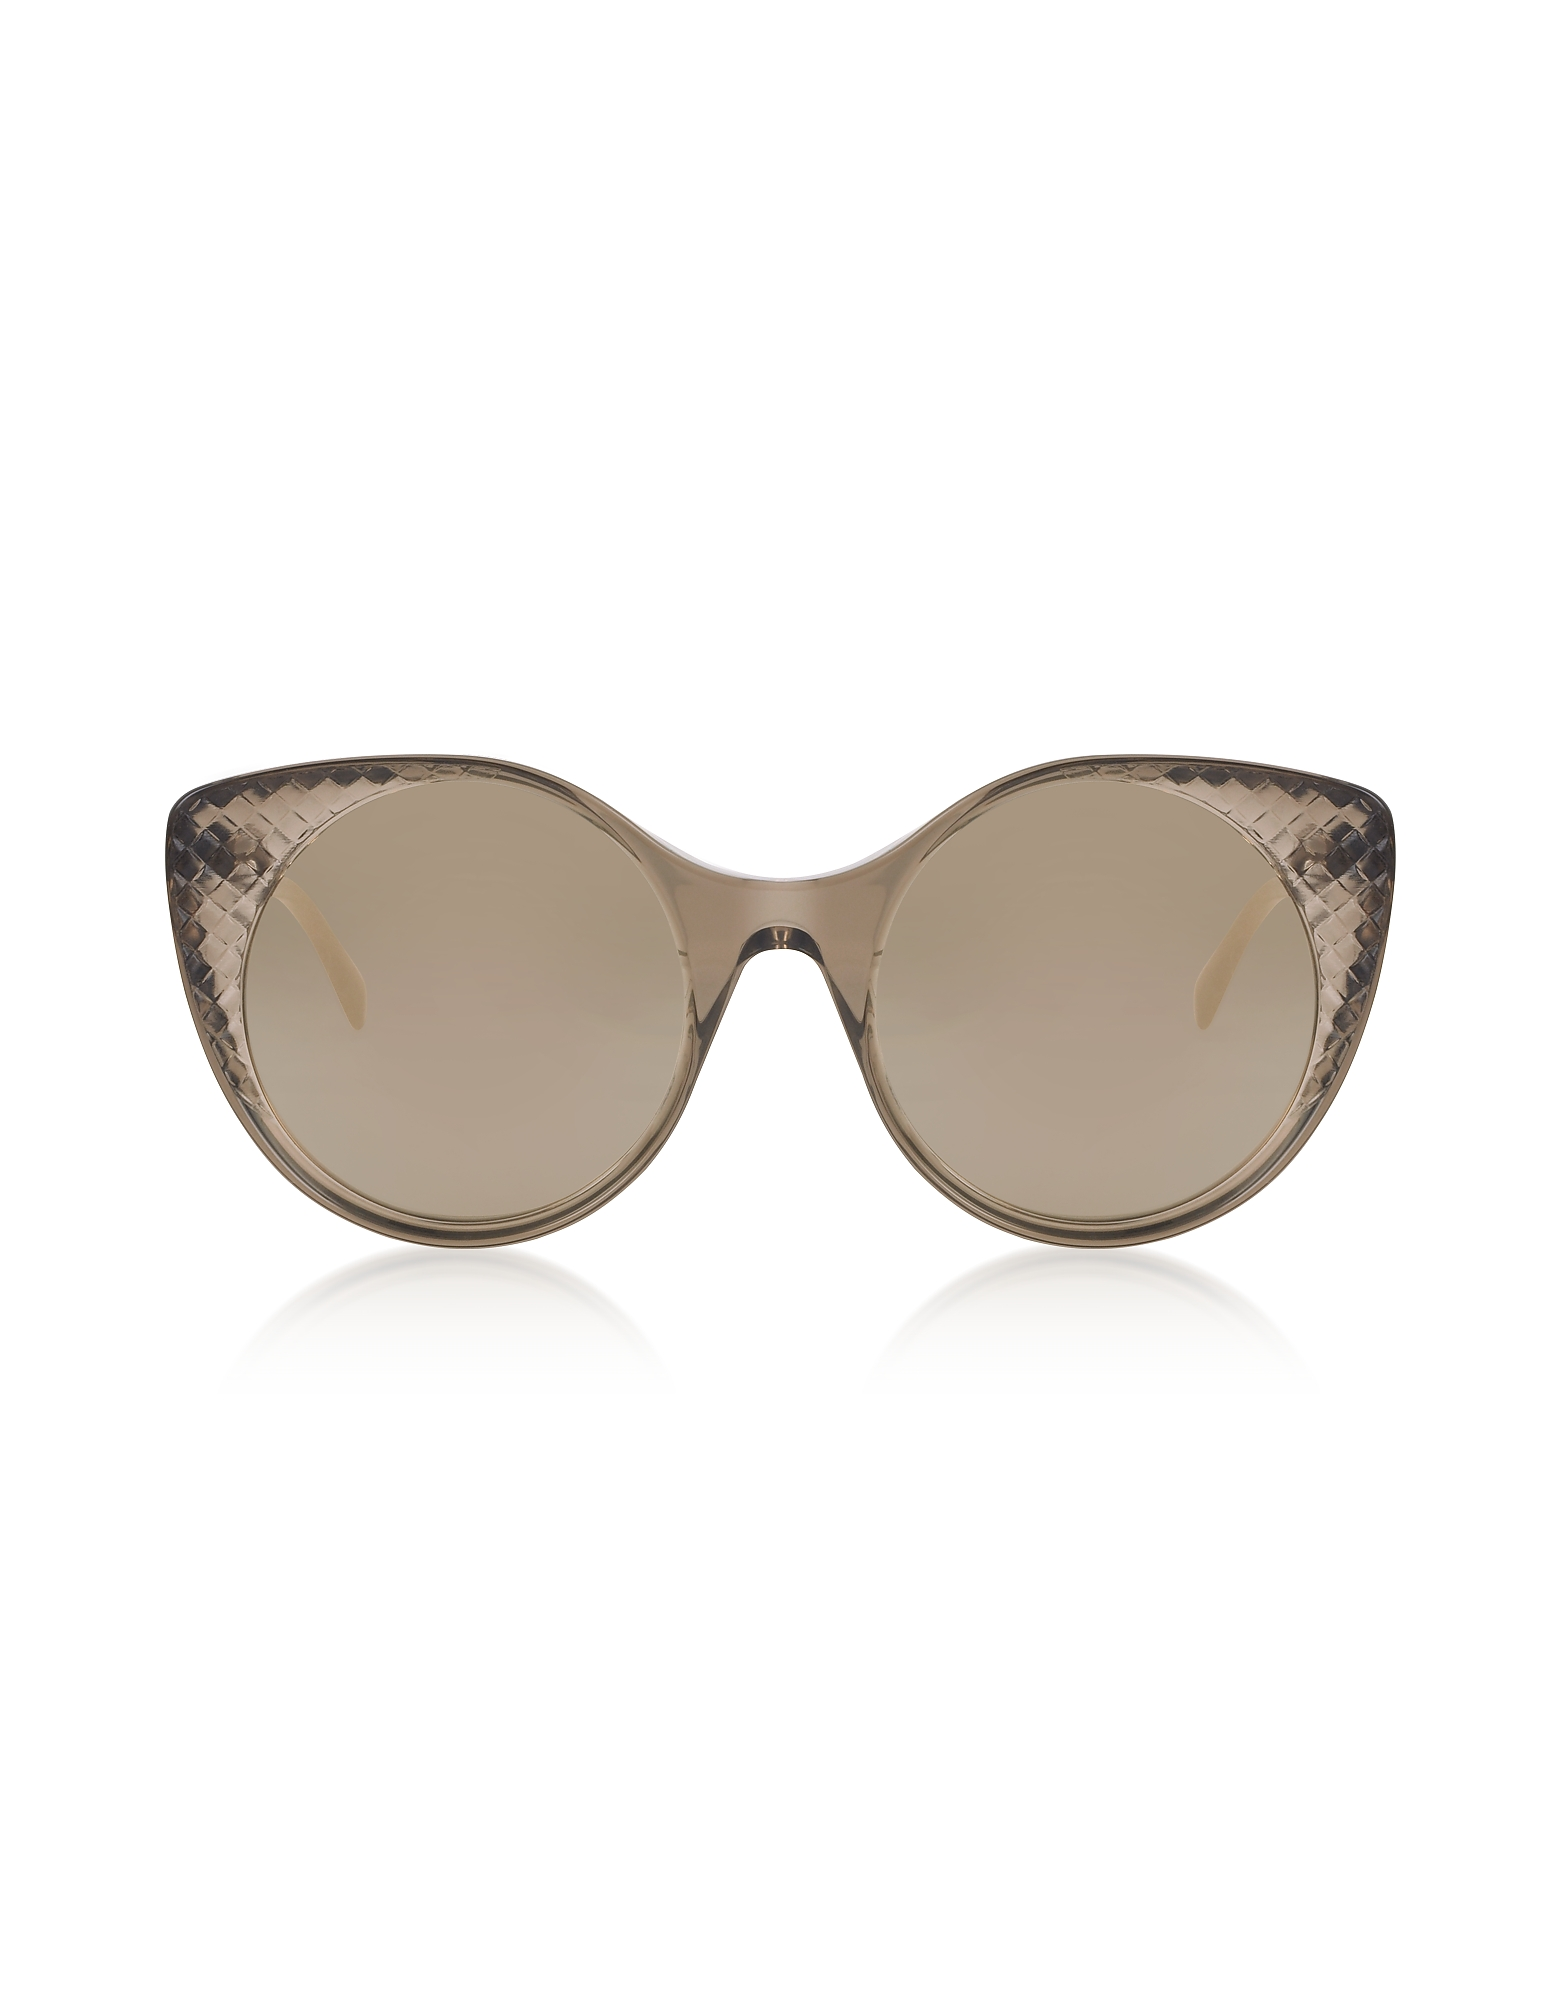 Bottega Veneta Sunglasses, BV0148S Transparent Brown Acetate Sunglasses